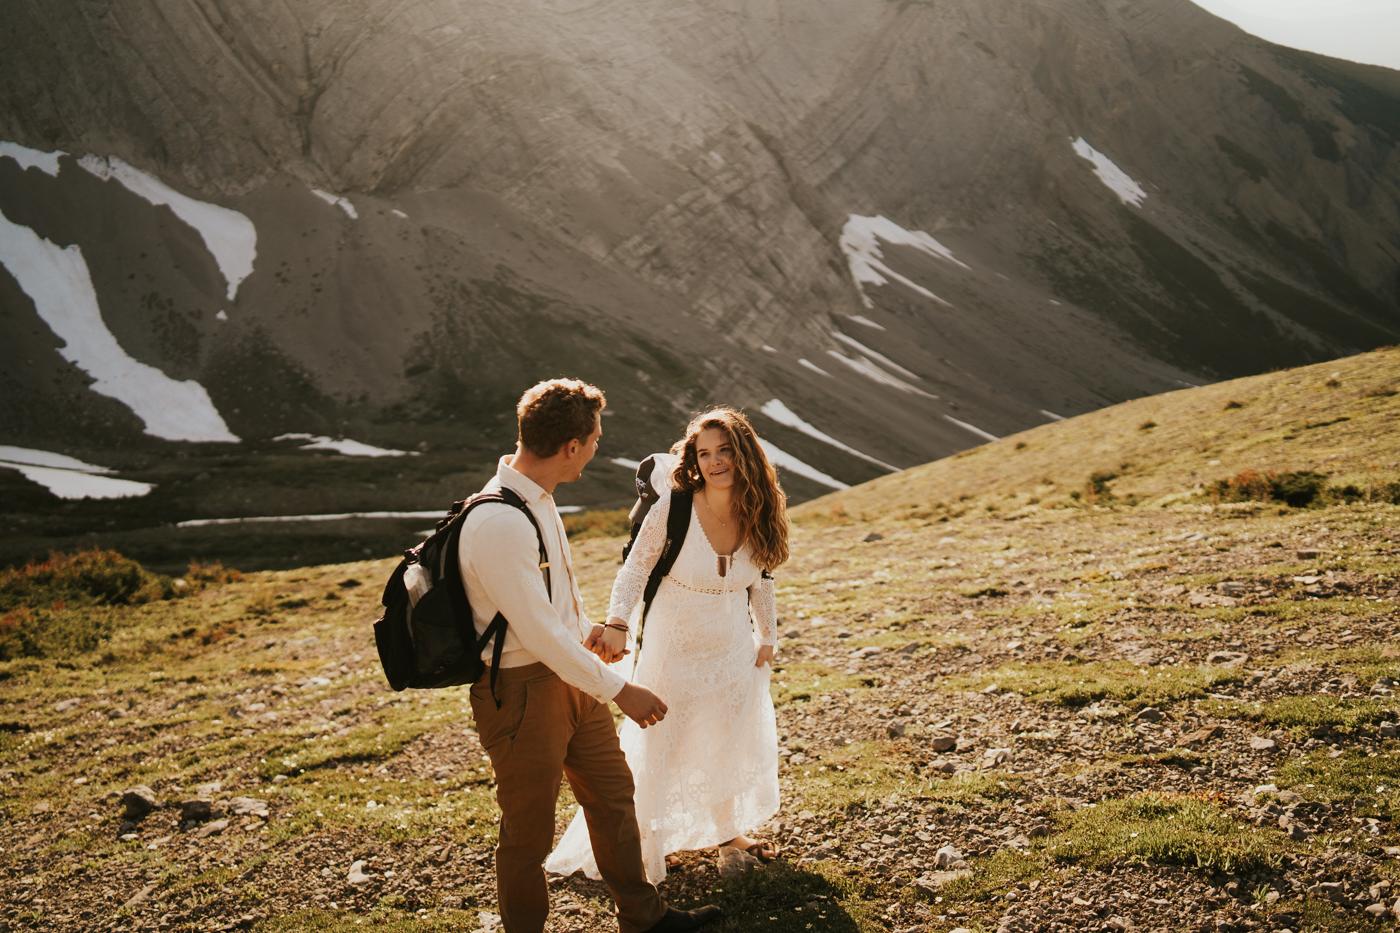 tyraephotography_photographer_wedding_elopement_engagement_photography-08486.jpg